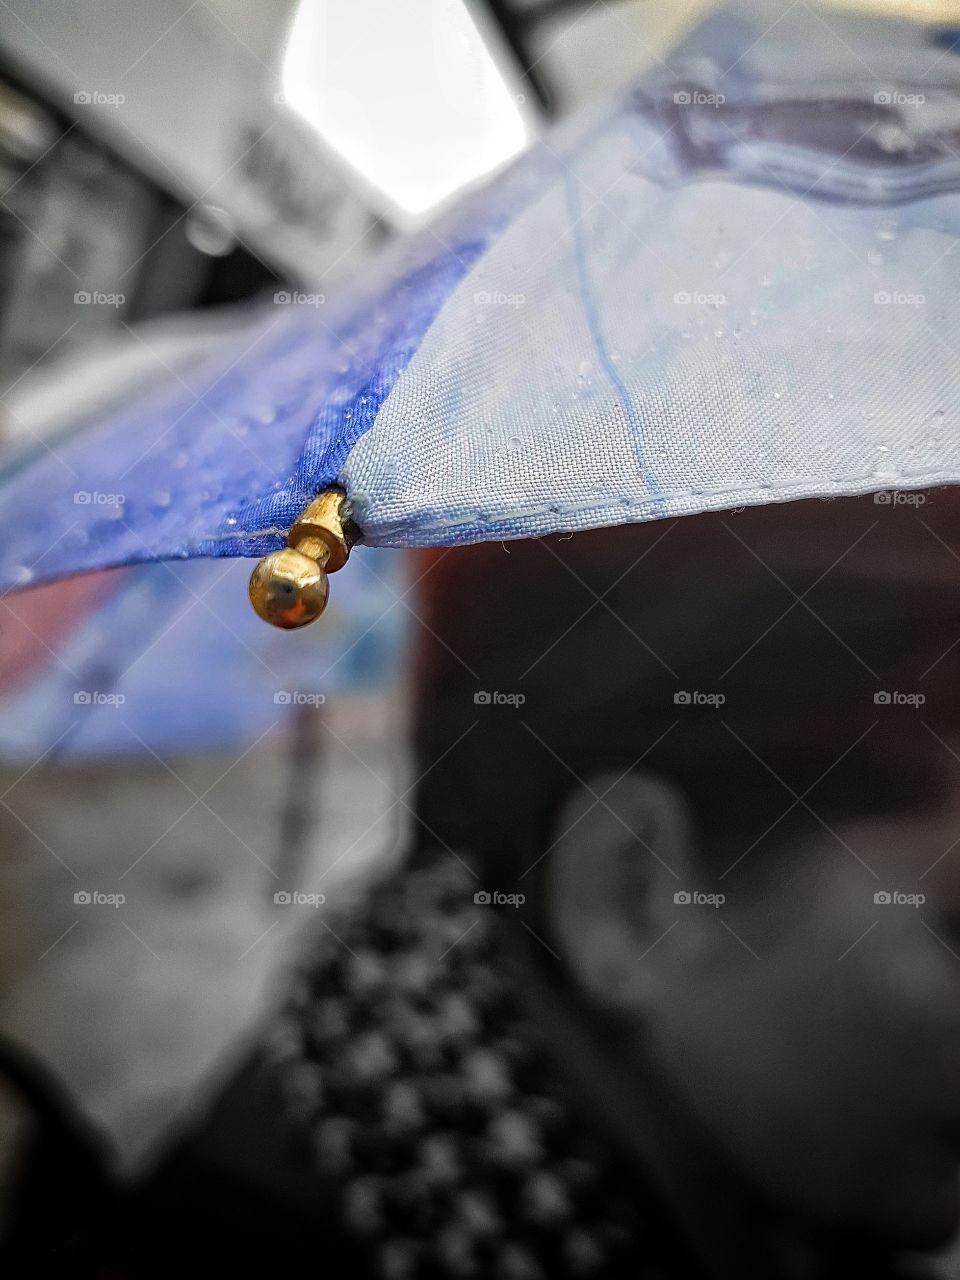 Rainy day in Bucharest.